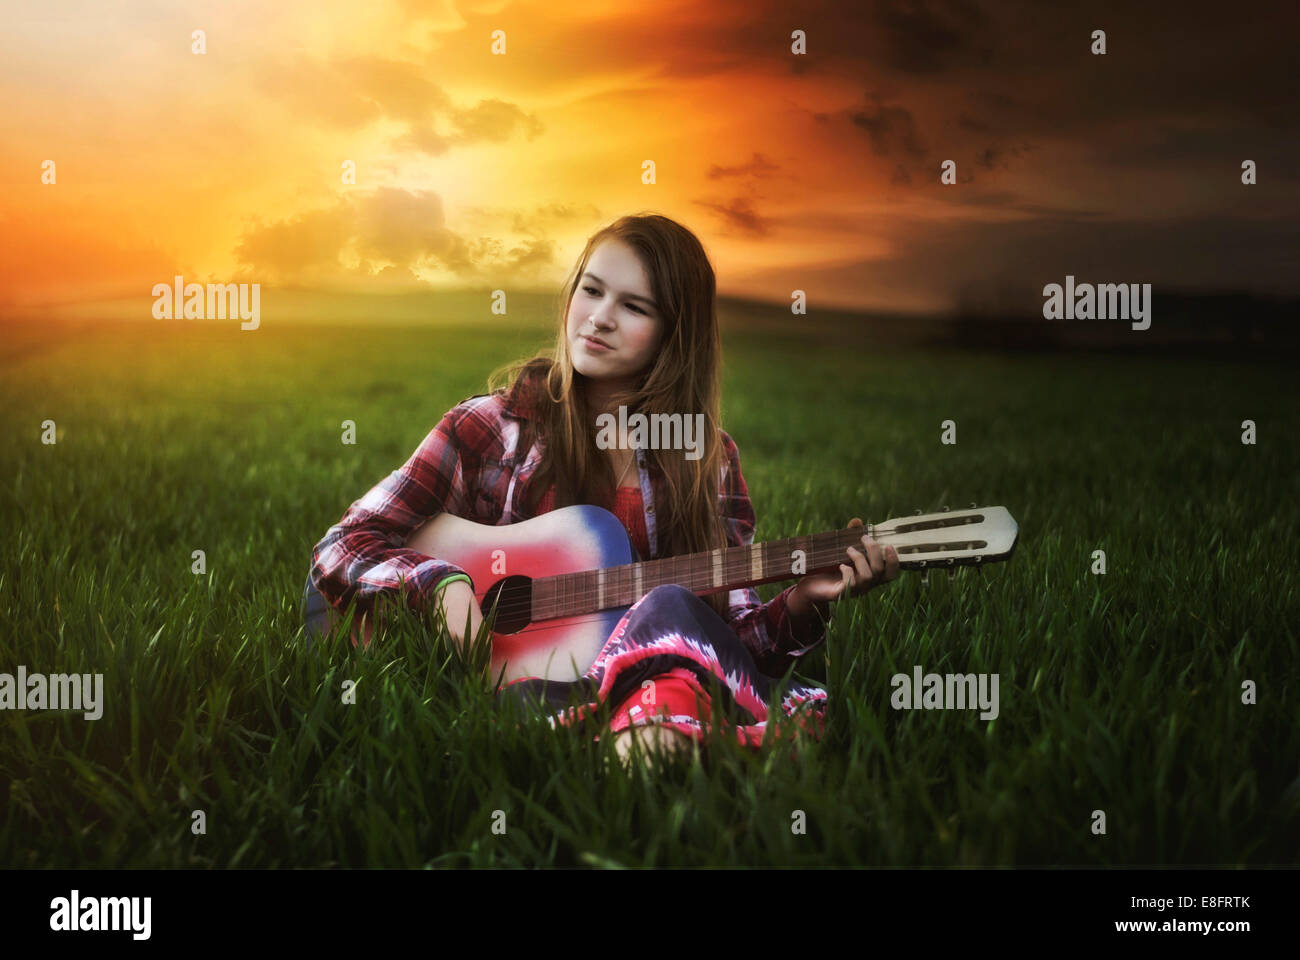 Mädchen sitzen im Feld bei Sonnenuntergang Gitarre spielen Stockbild